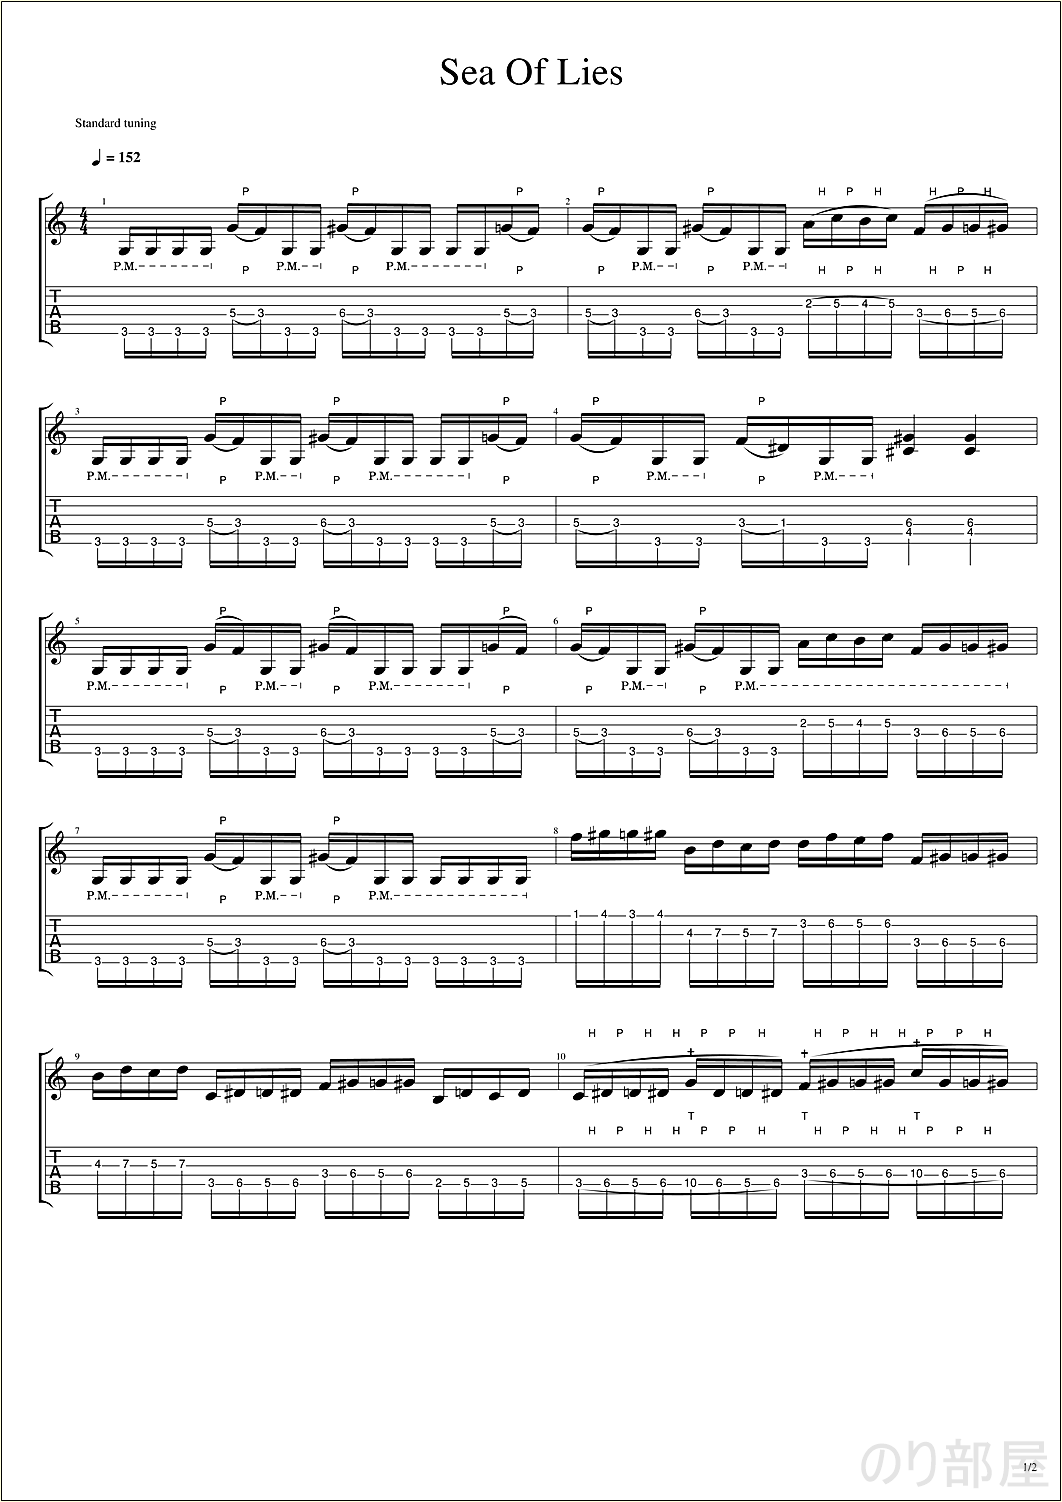 【TAB】Whole Tone Down.1音下げのTAB【TAB】Sea Of Lies / Symphony X  Intro Guitar Michael Romeo シンフォニーX マイケルロメオ ギター基礎練習 BPM70-152【Picking・Tapping】